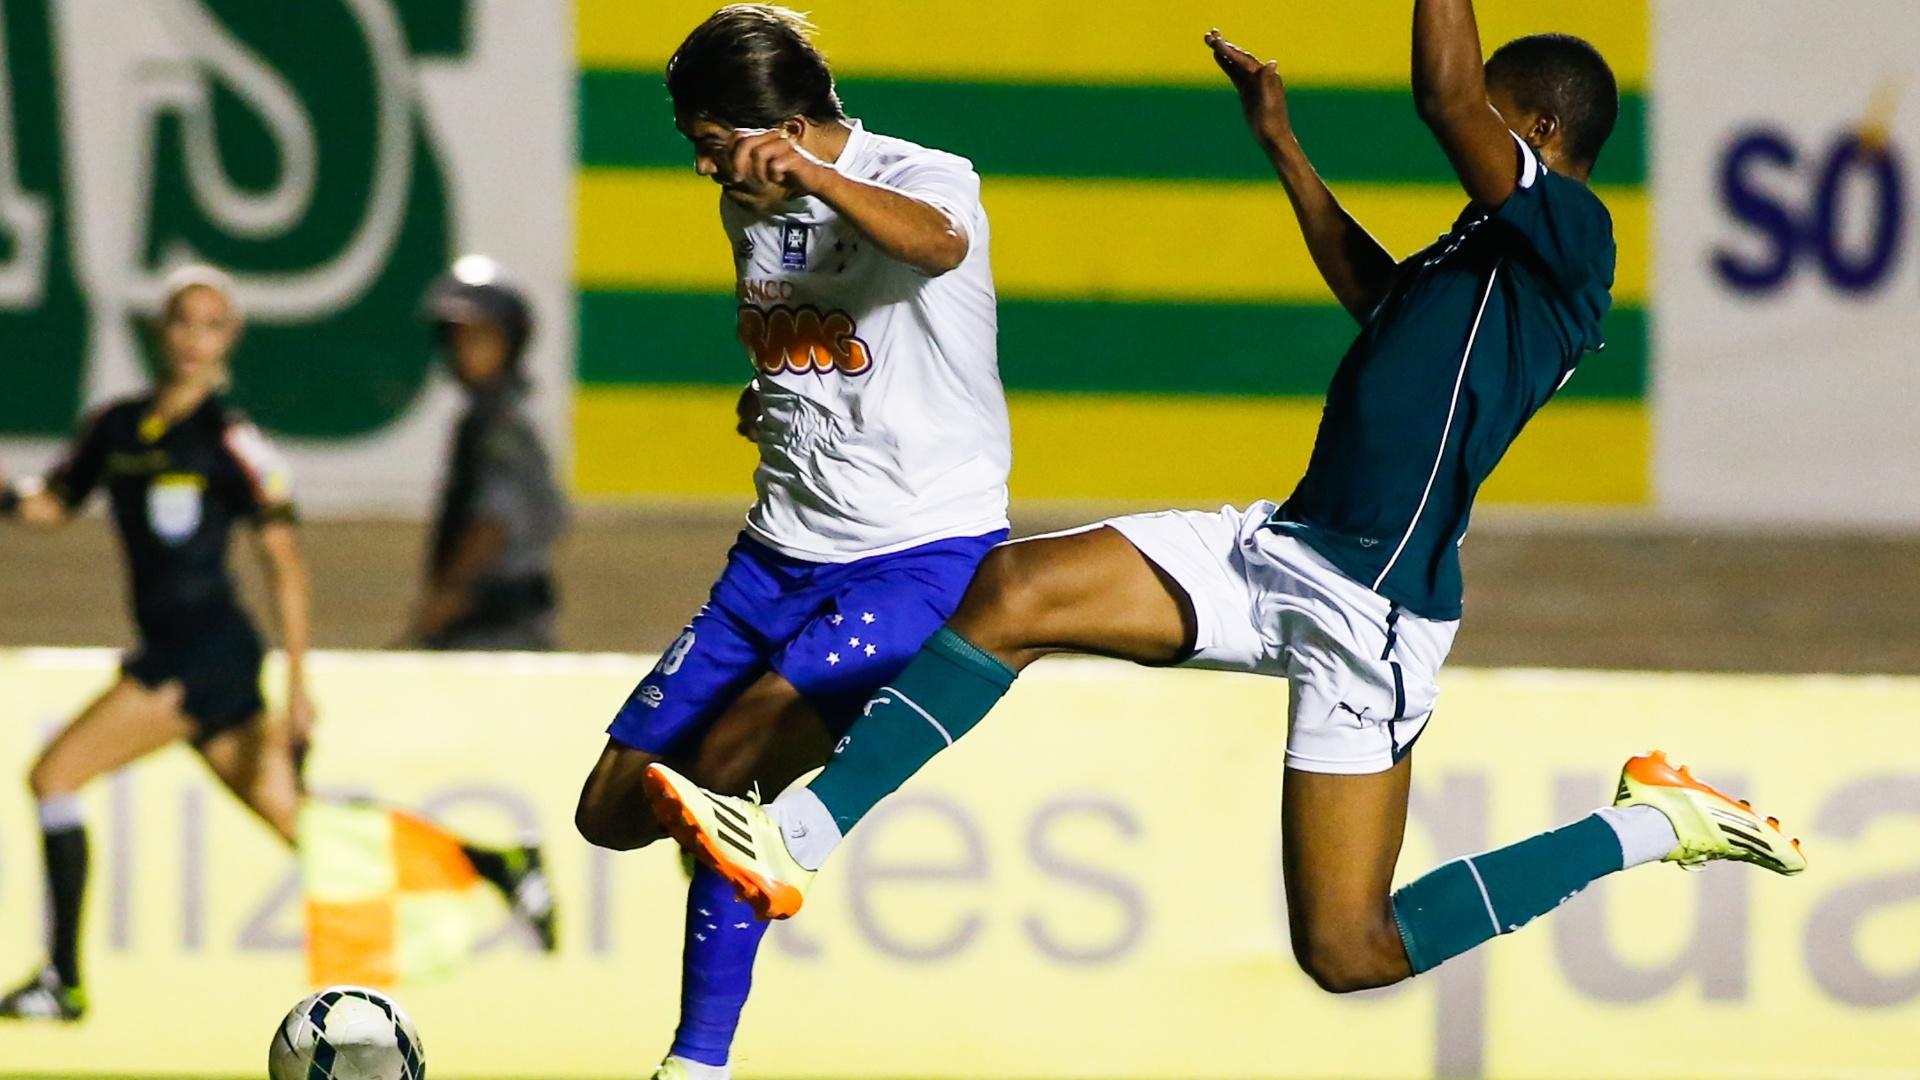 Marcelo Moreno chuta durante do jogo do Cruzeiro